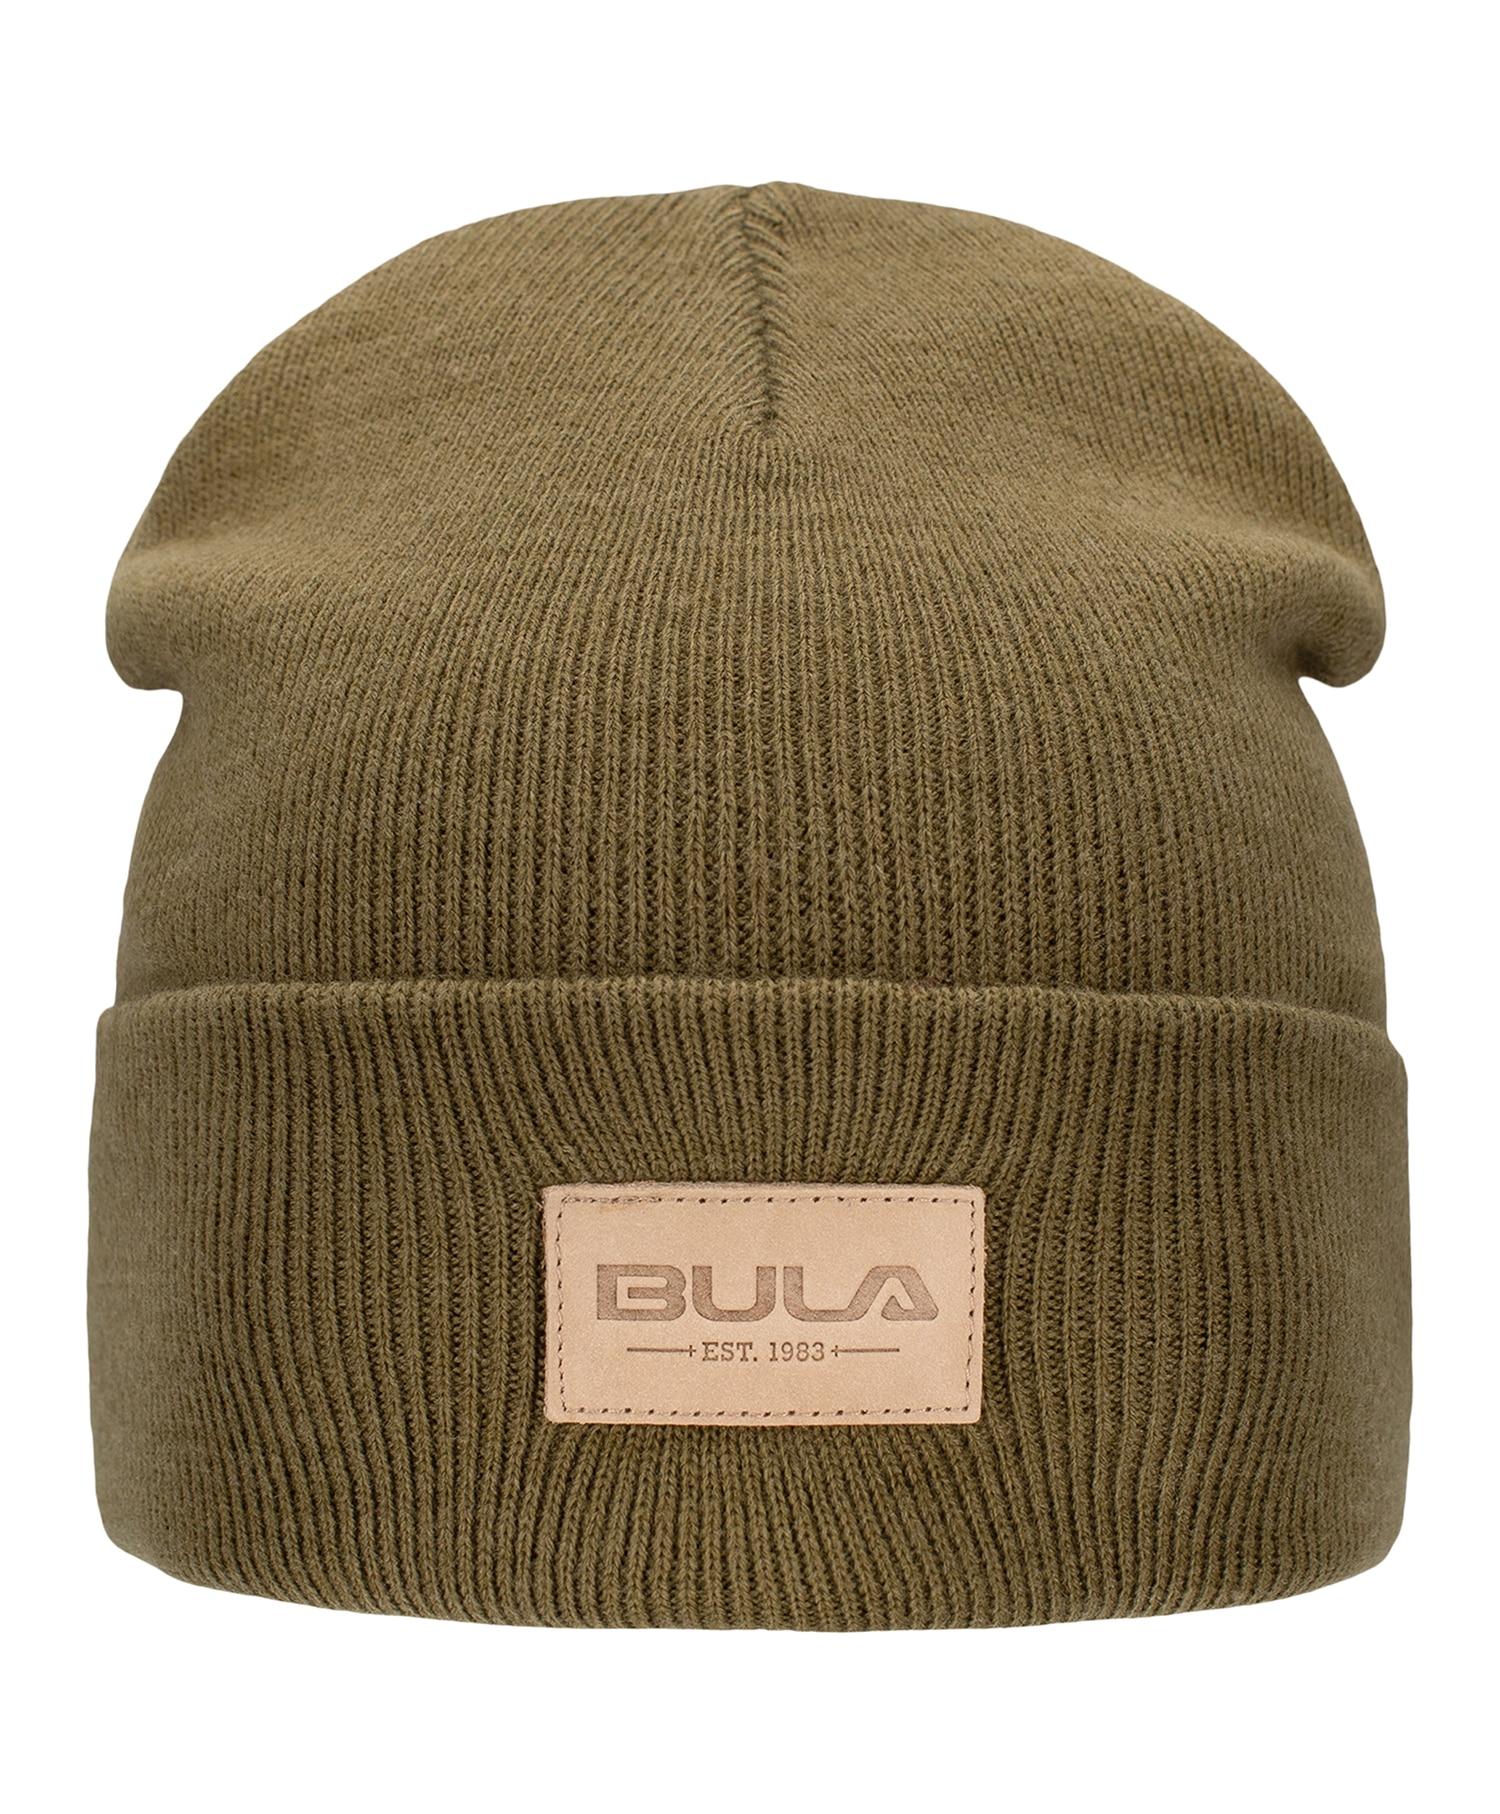 Bula Travel Beanie